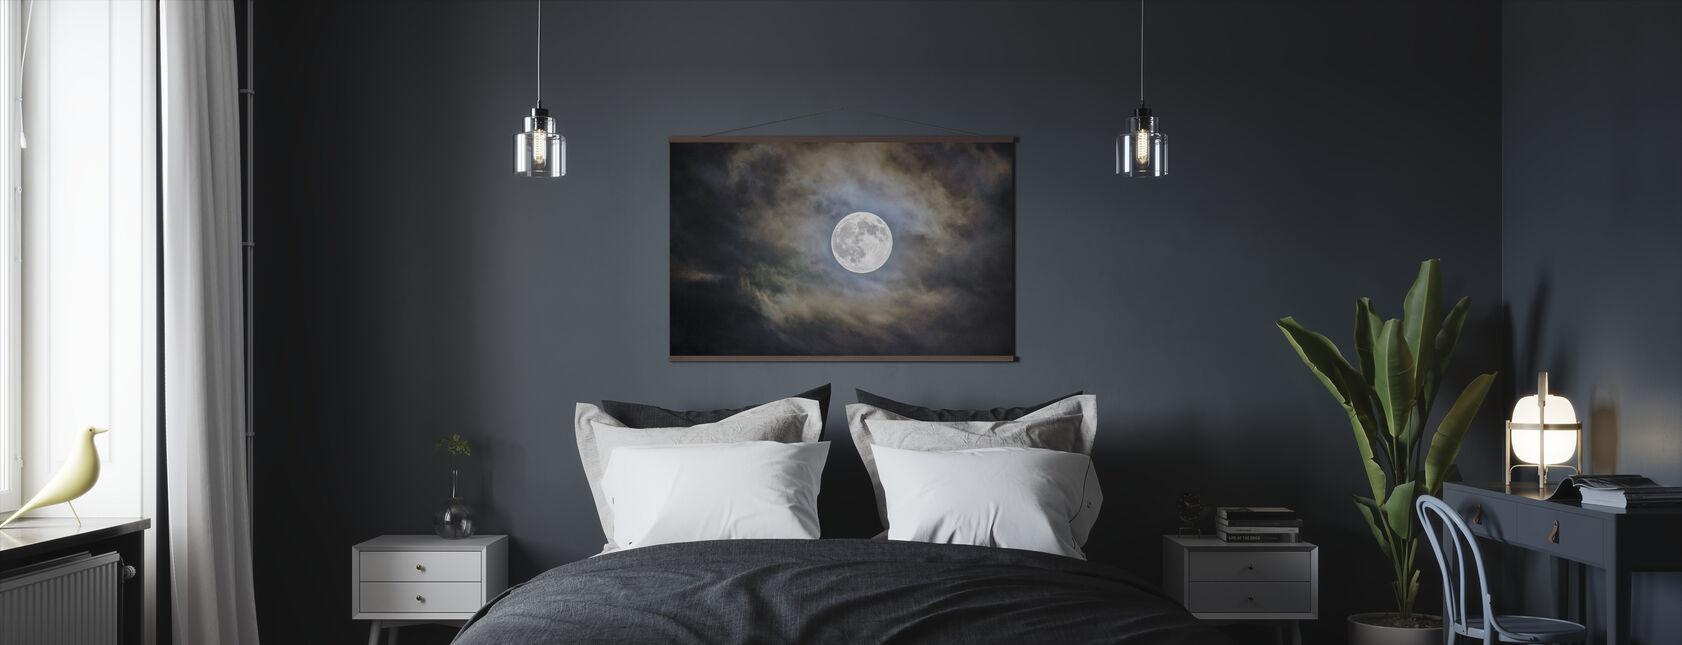 Cloudy Moon - Poster - Bedroom